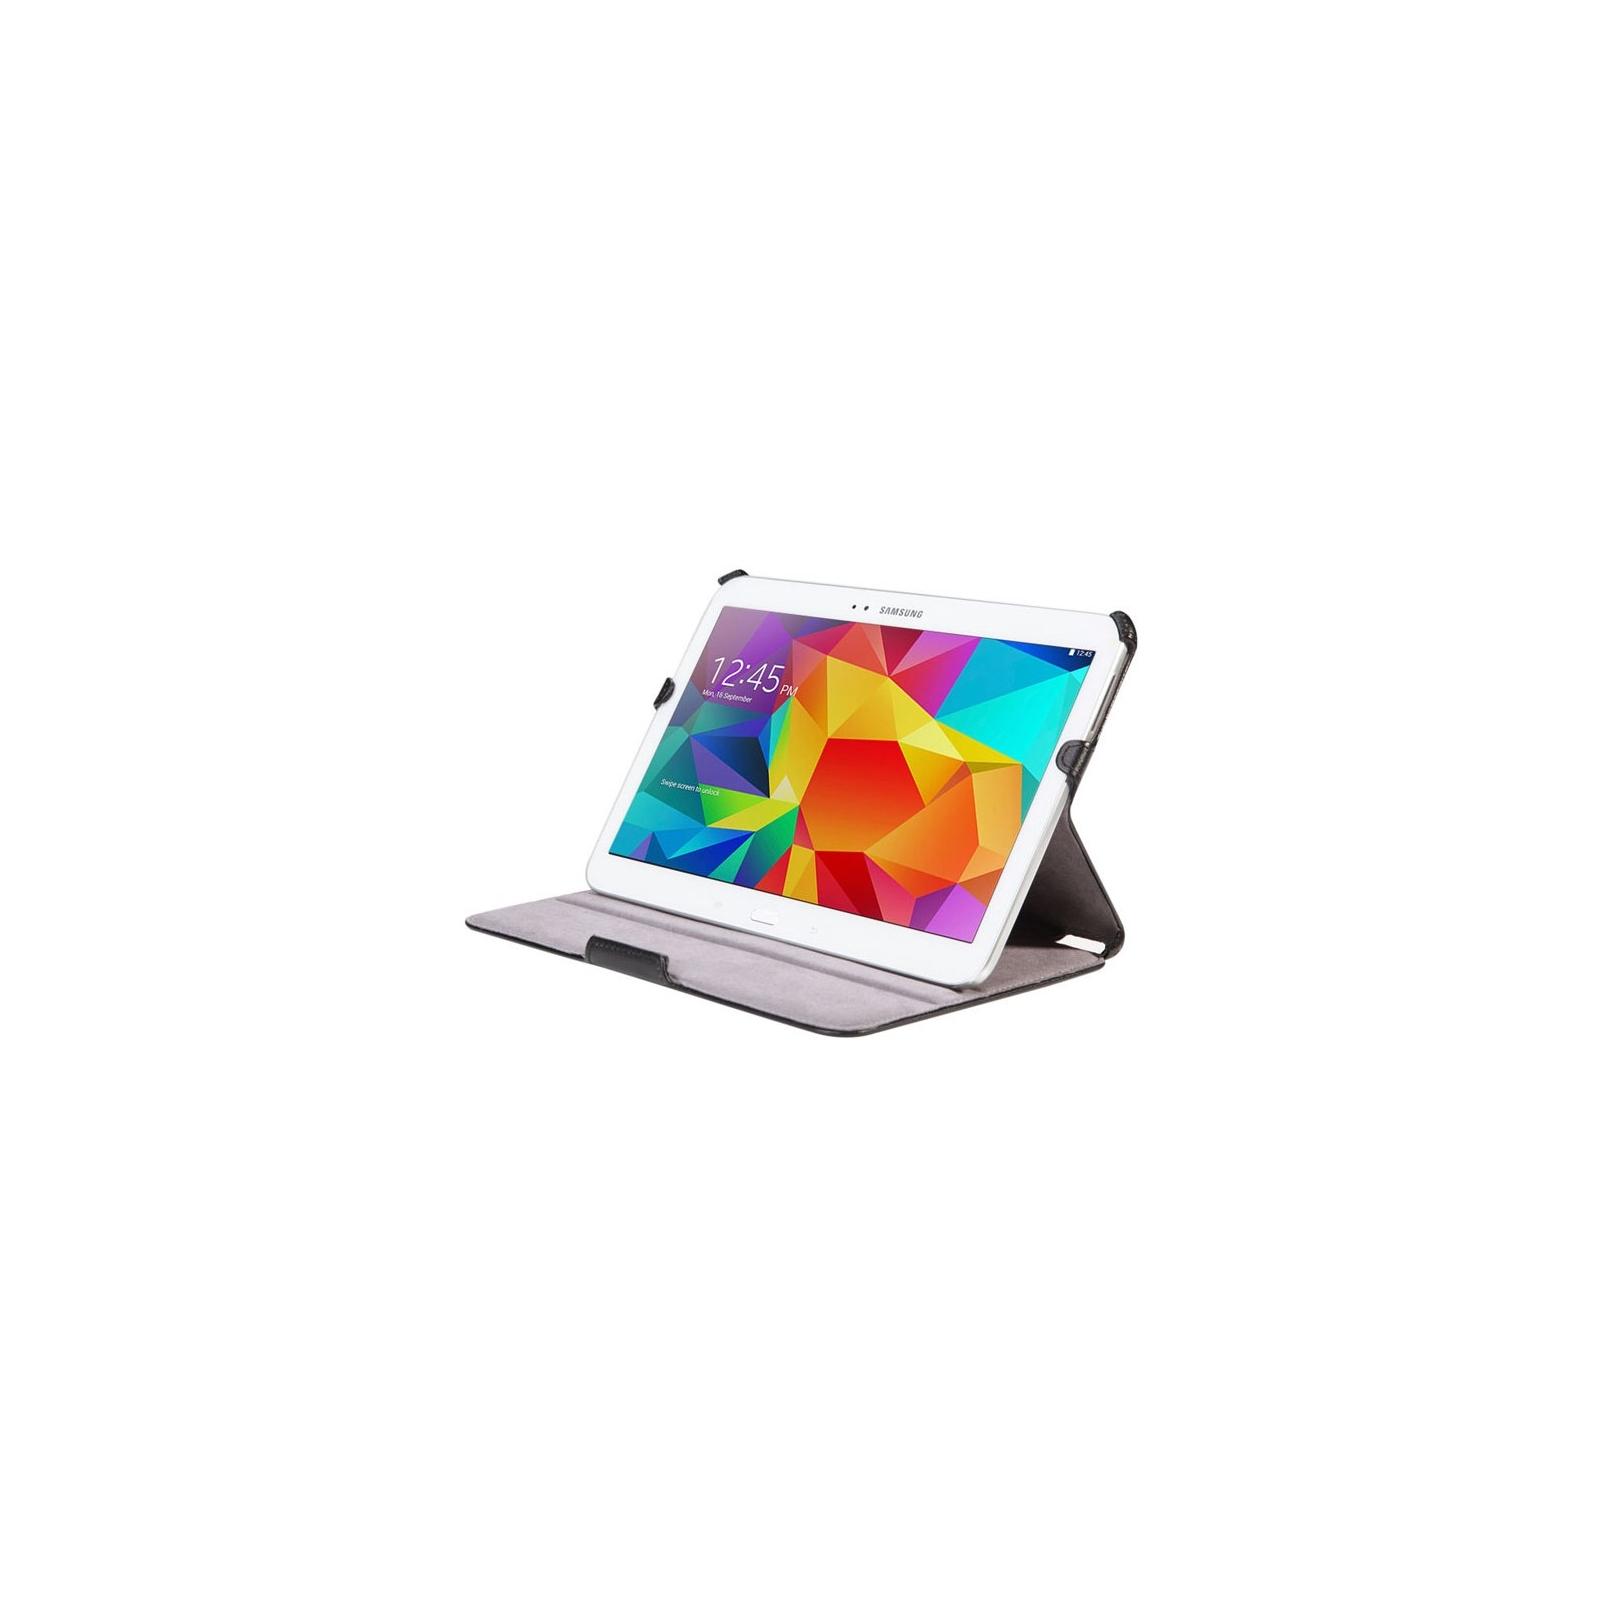 Чехол для планшета AirOn для Samsung GALAXY Tab 4 10.1 black (6946795850175)